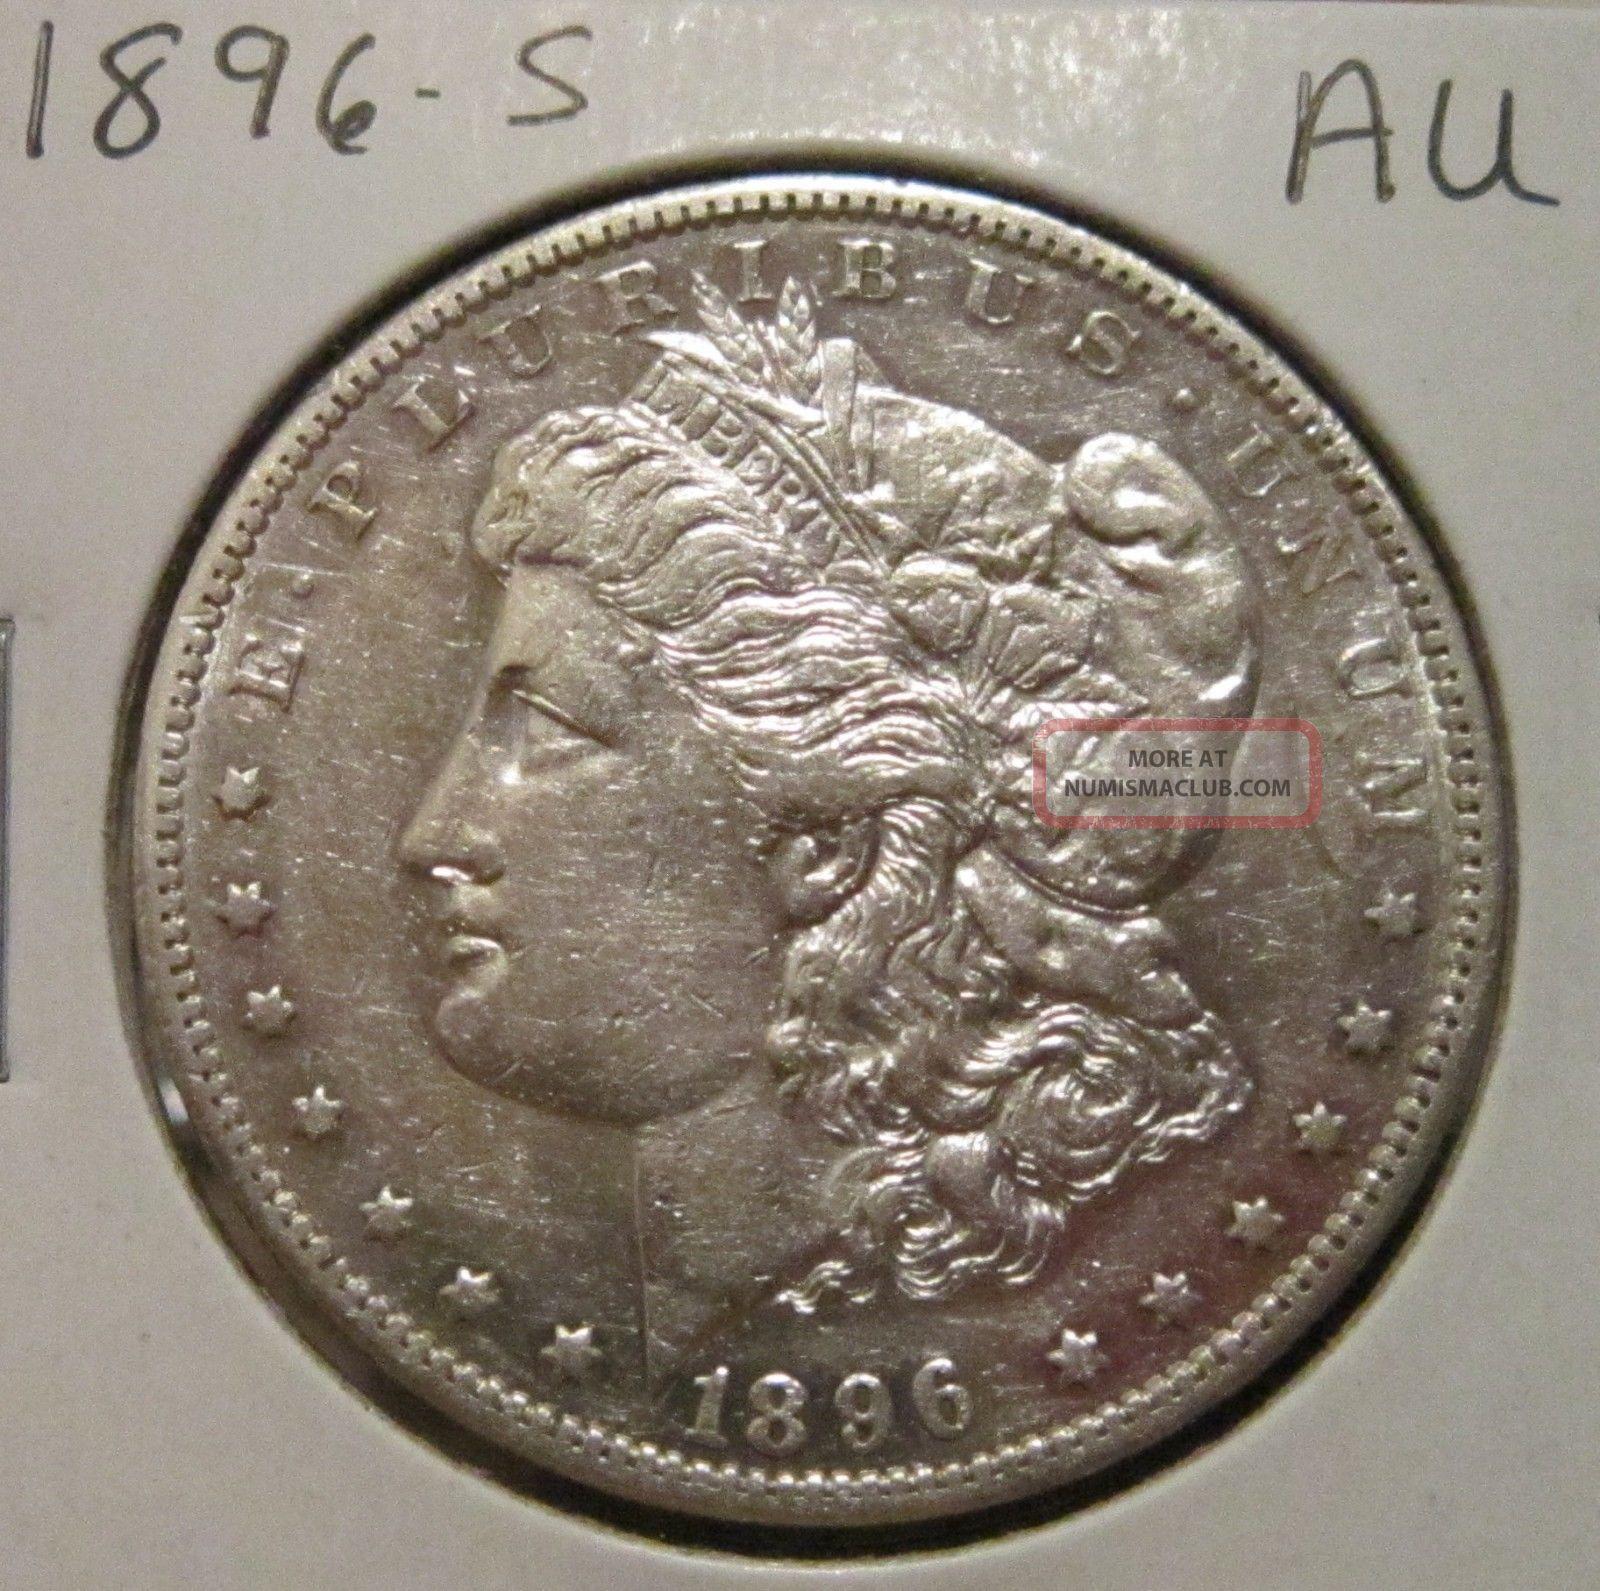 1896 S Morgan Silver Dollar Au Rare Key Date Us Silver Coin